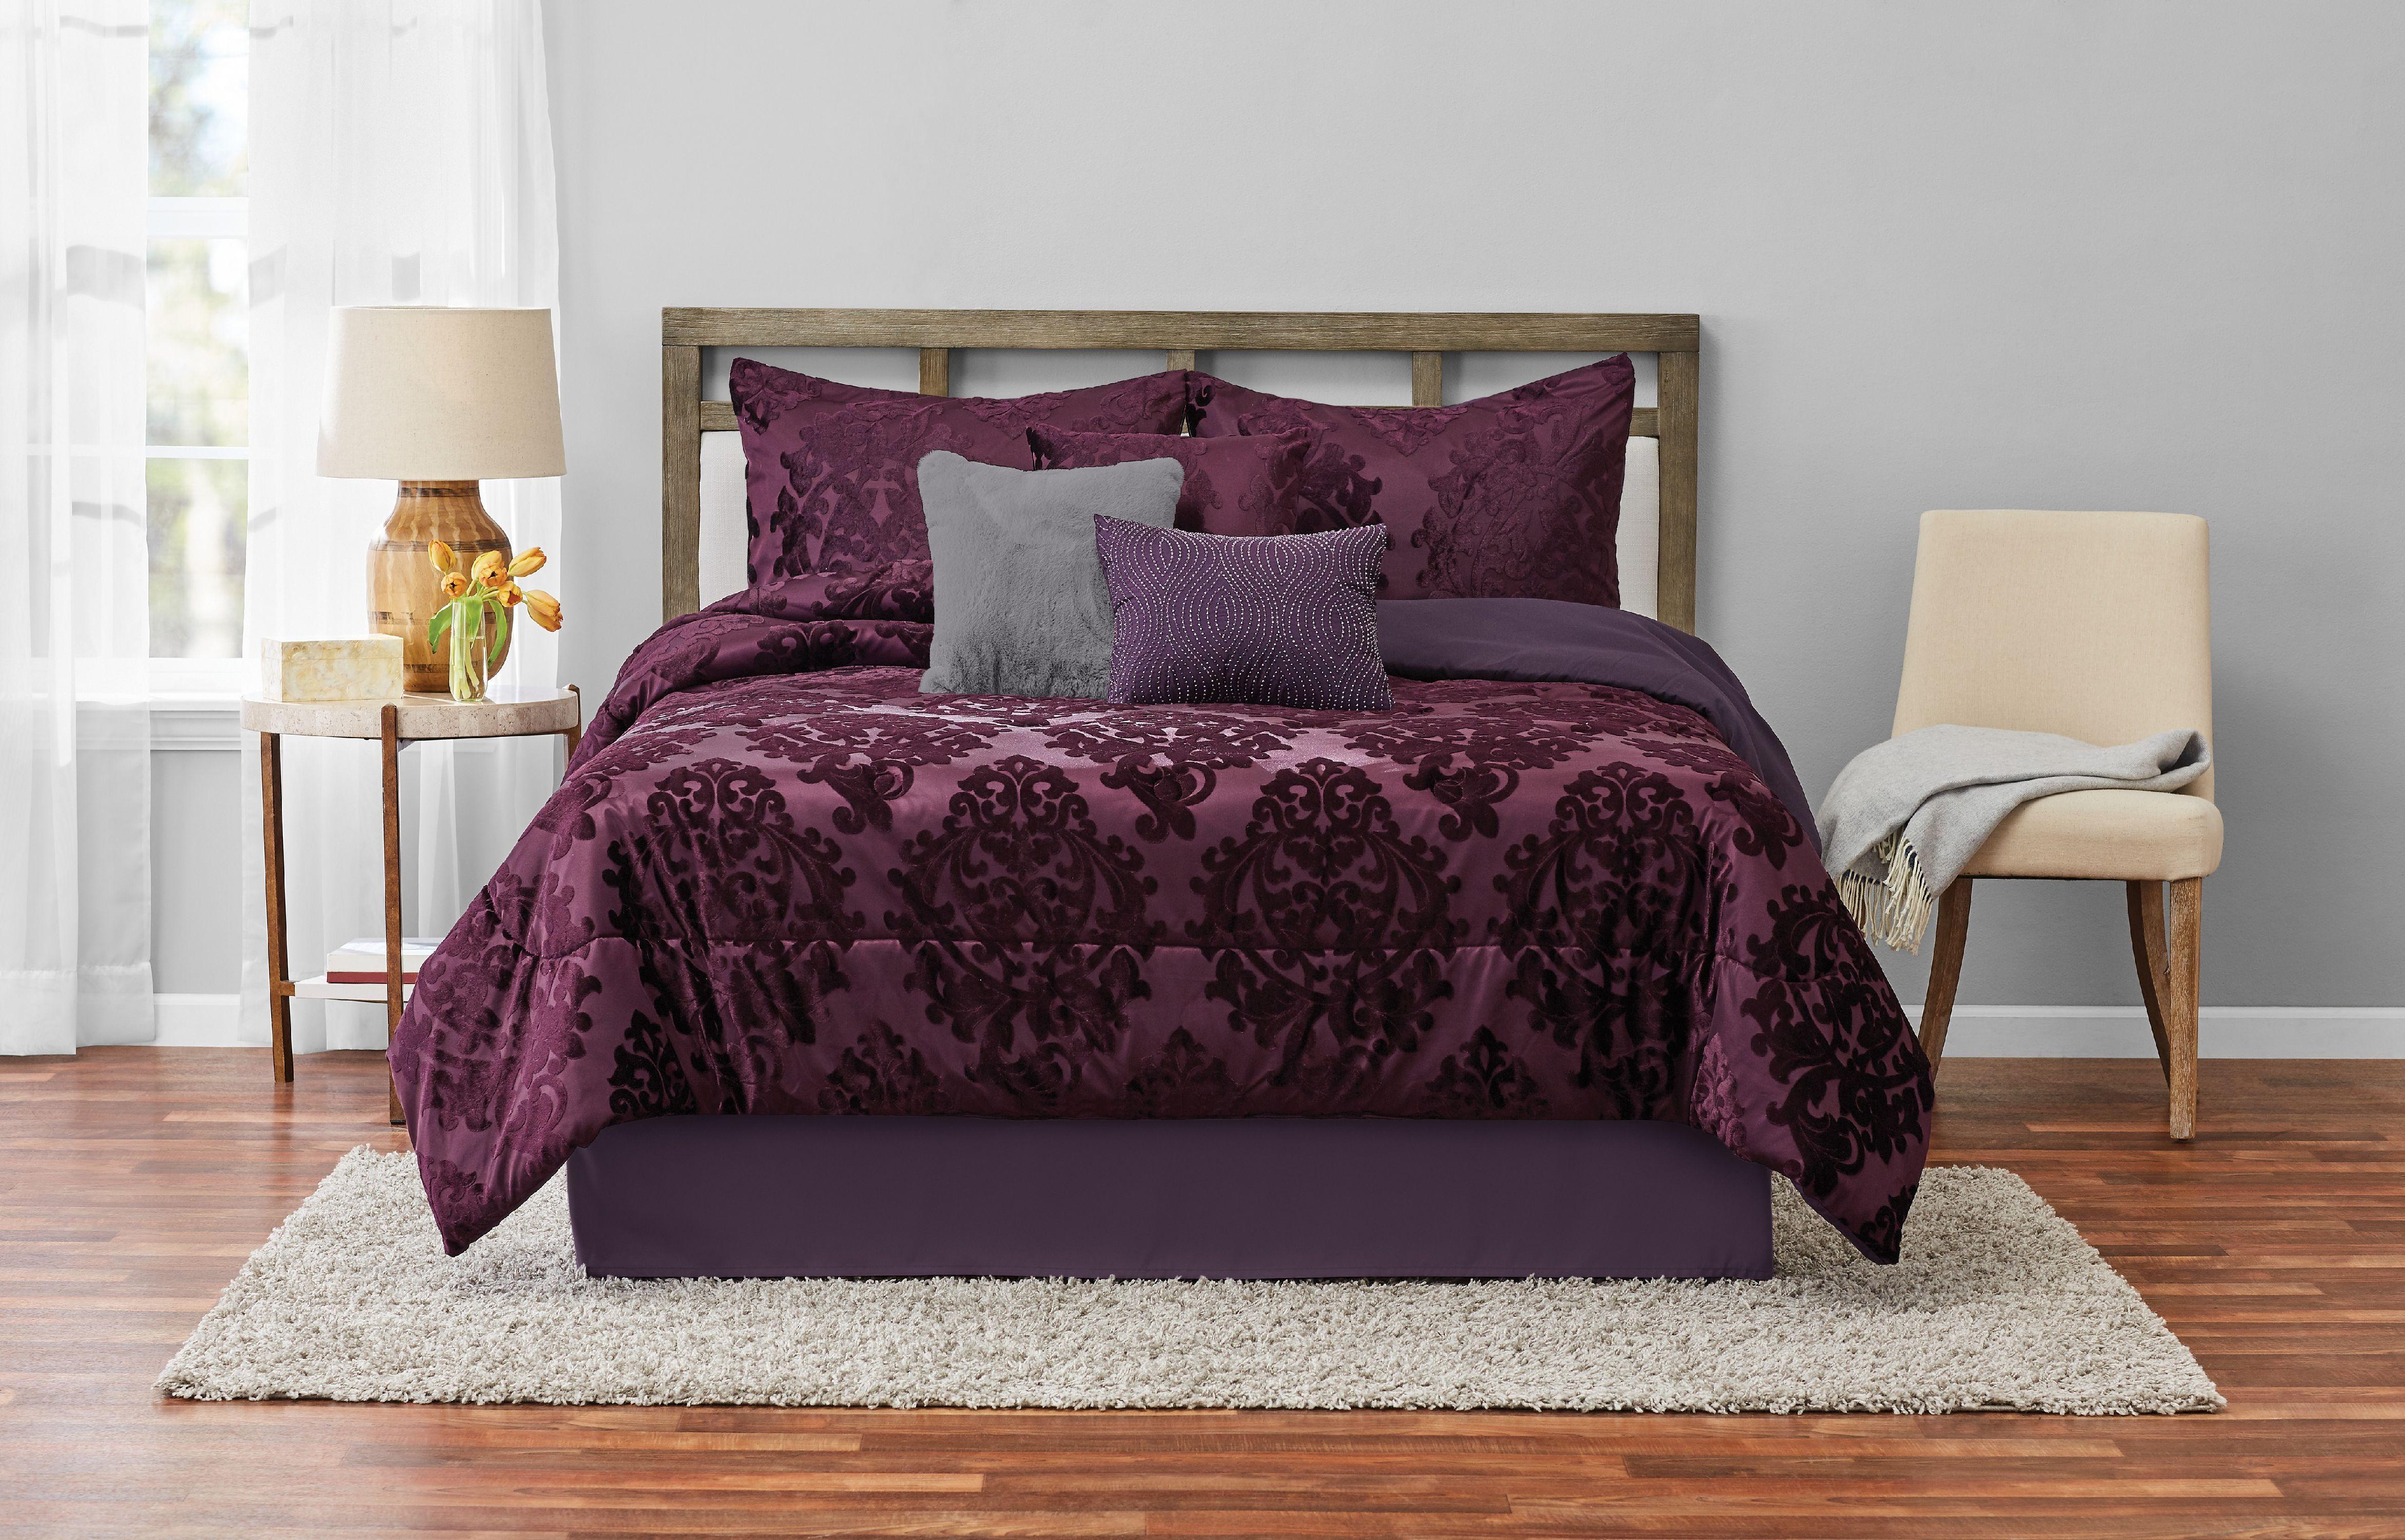 Mainstays Armin Burnout Velvet Damask 7 Piece Comforter Set King Plum Walmart Com Walmart Com